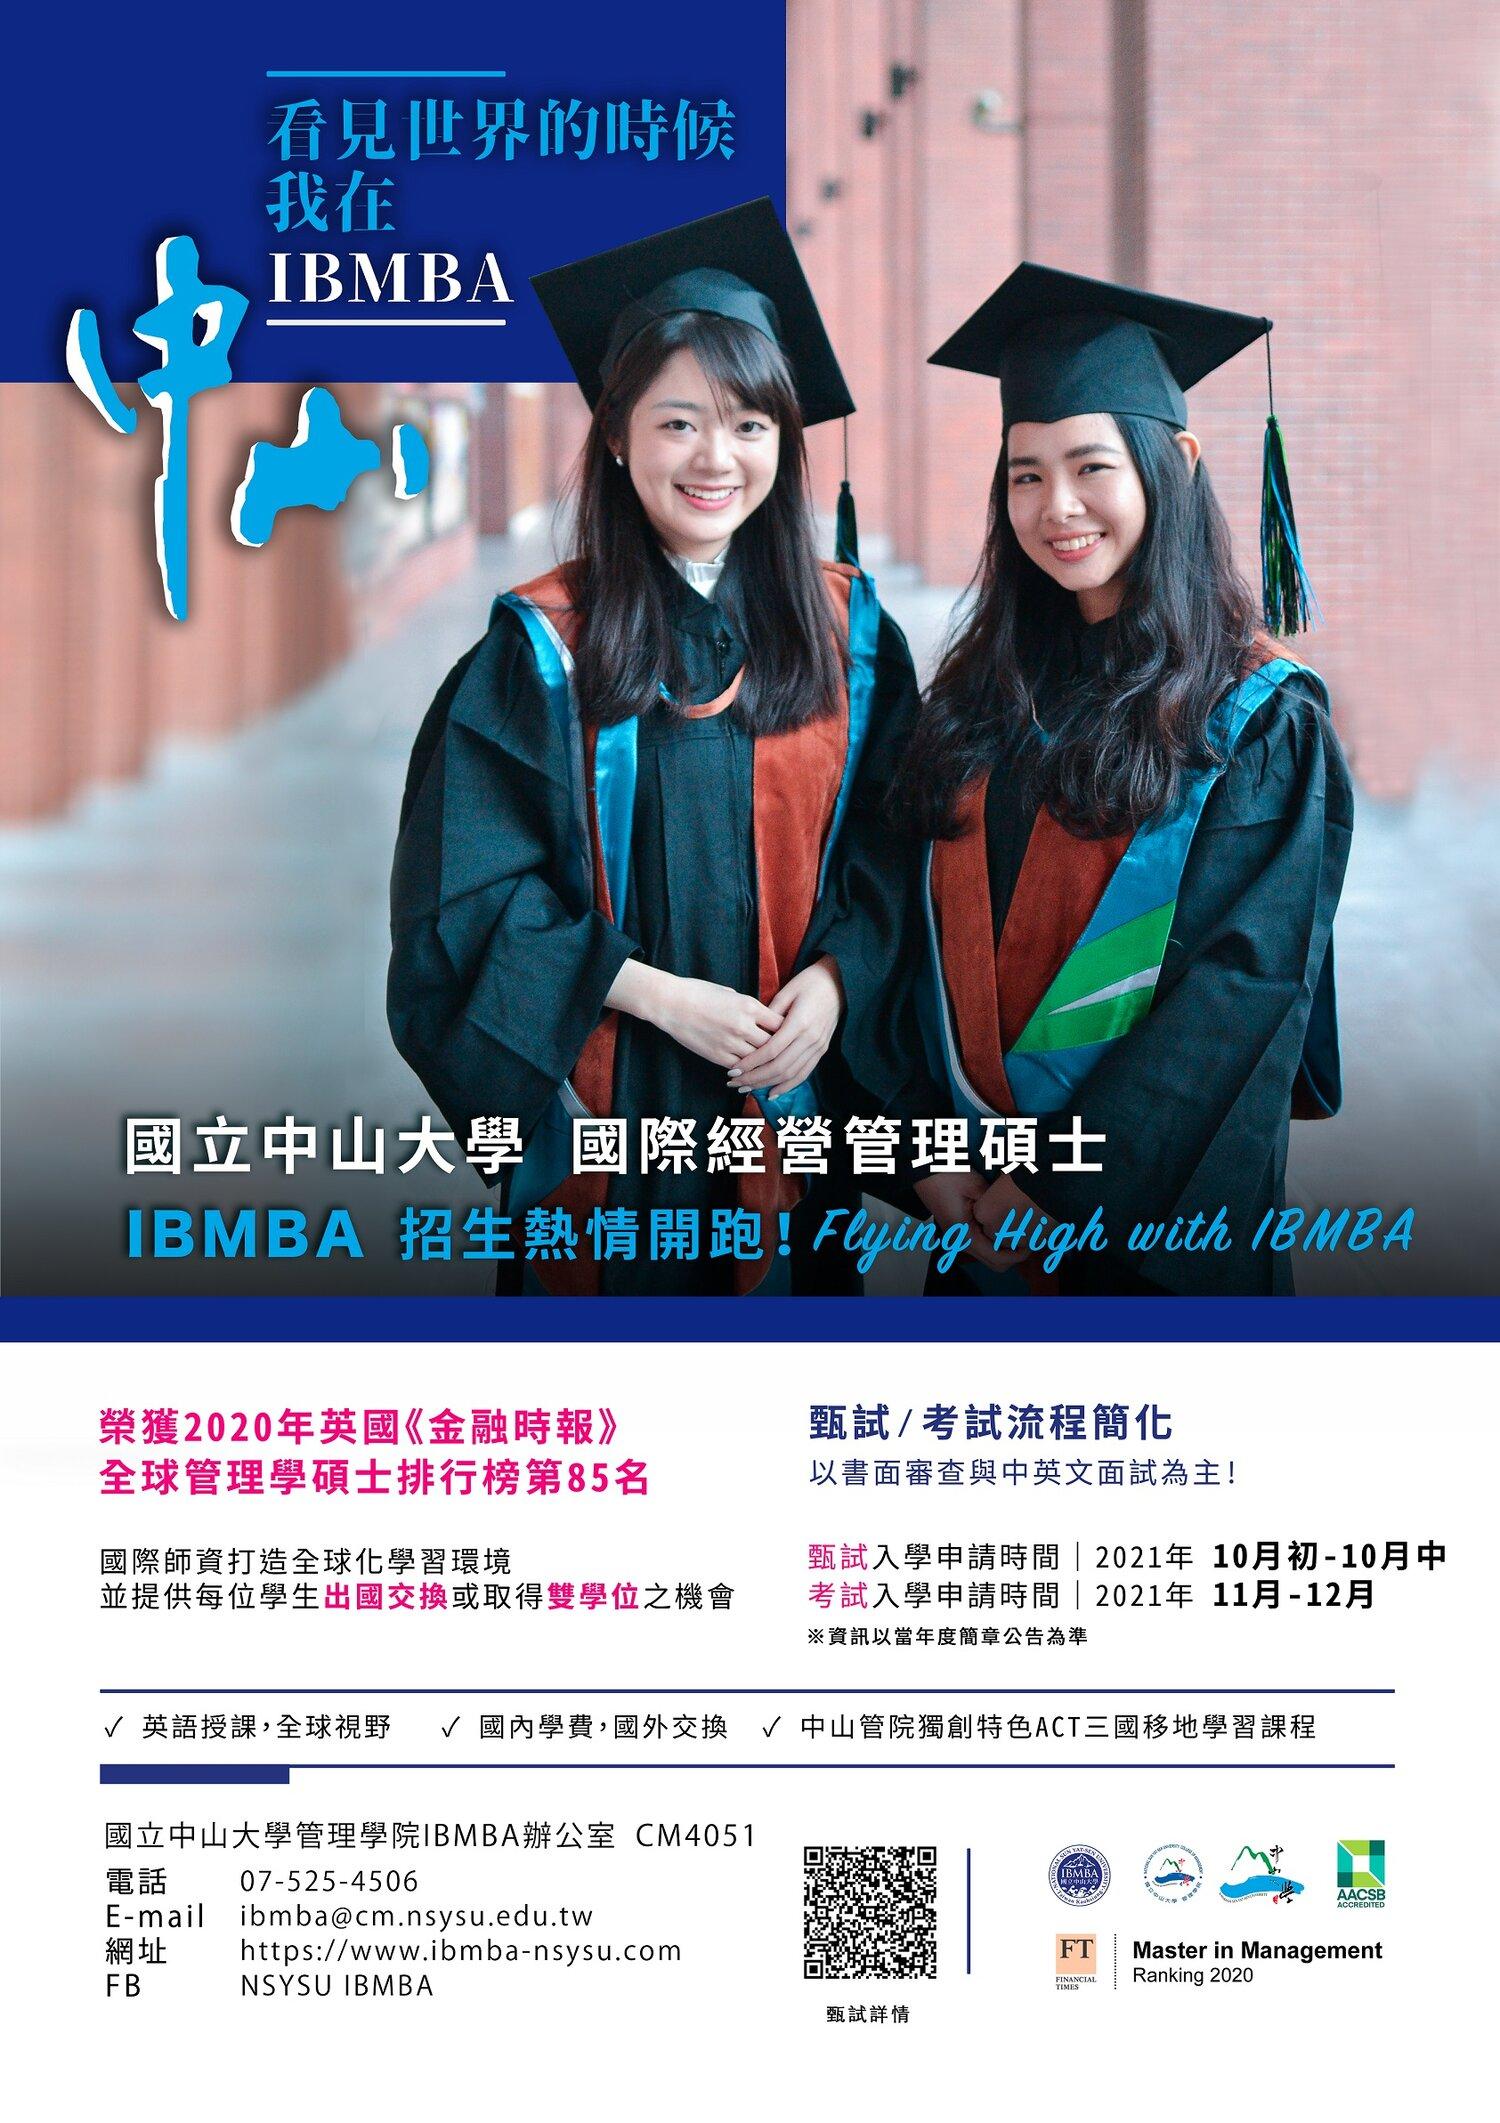 20210818_IBMBA_poster_Small.jpg